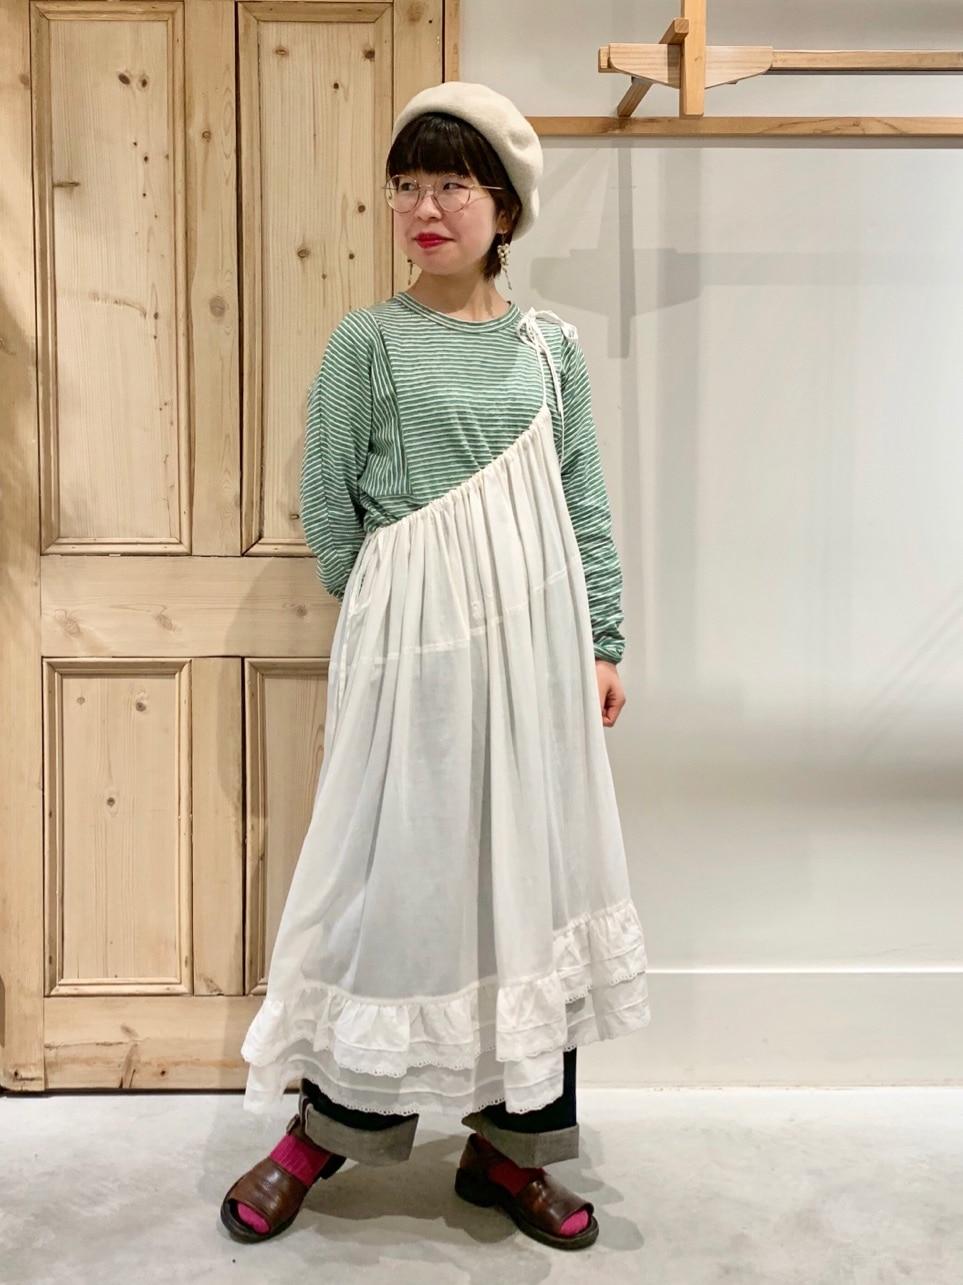 Malle chambre de charme 調布パルコ 身長:153cm 2020.10.12